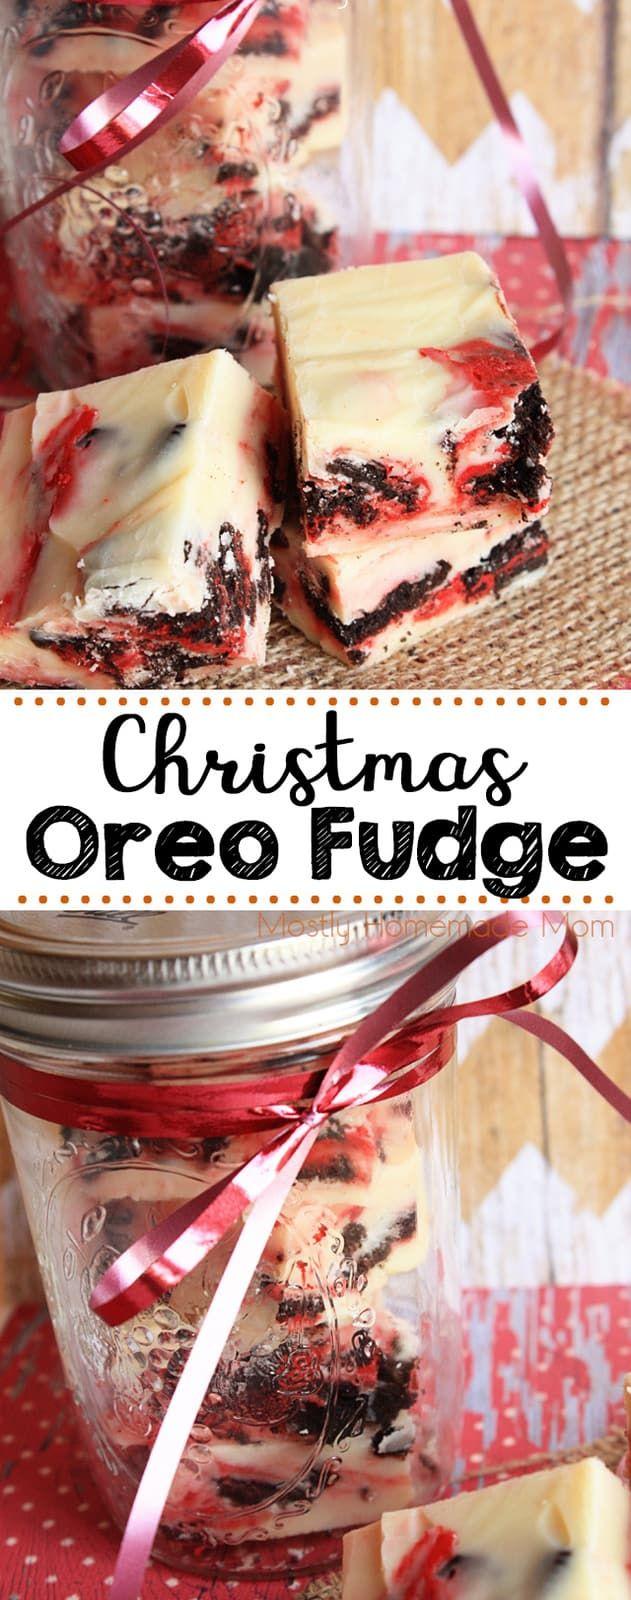 Christmas Oreo Fudge Video Tutorial Mostly Homemade Mom Recipe Oreo Fudge Christmas Fudge Oreo